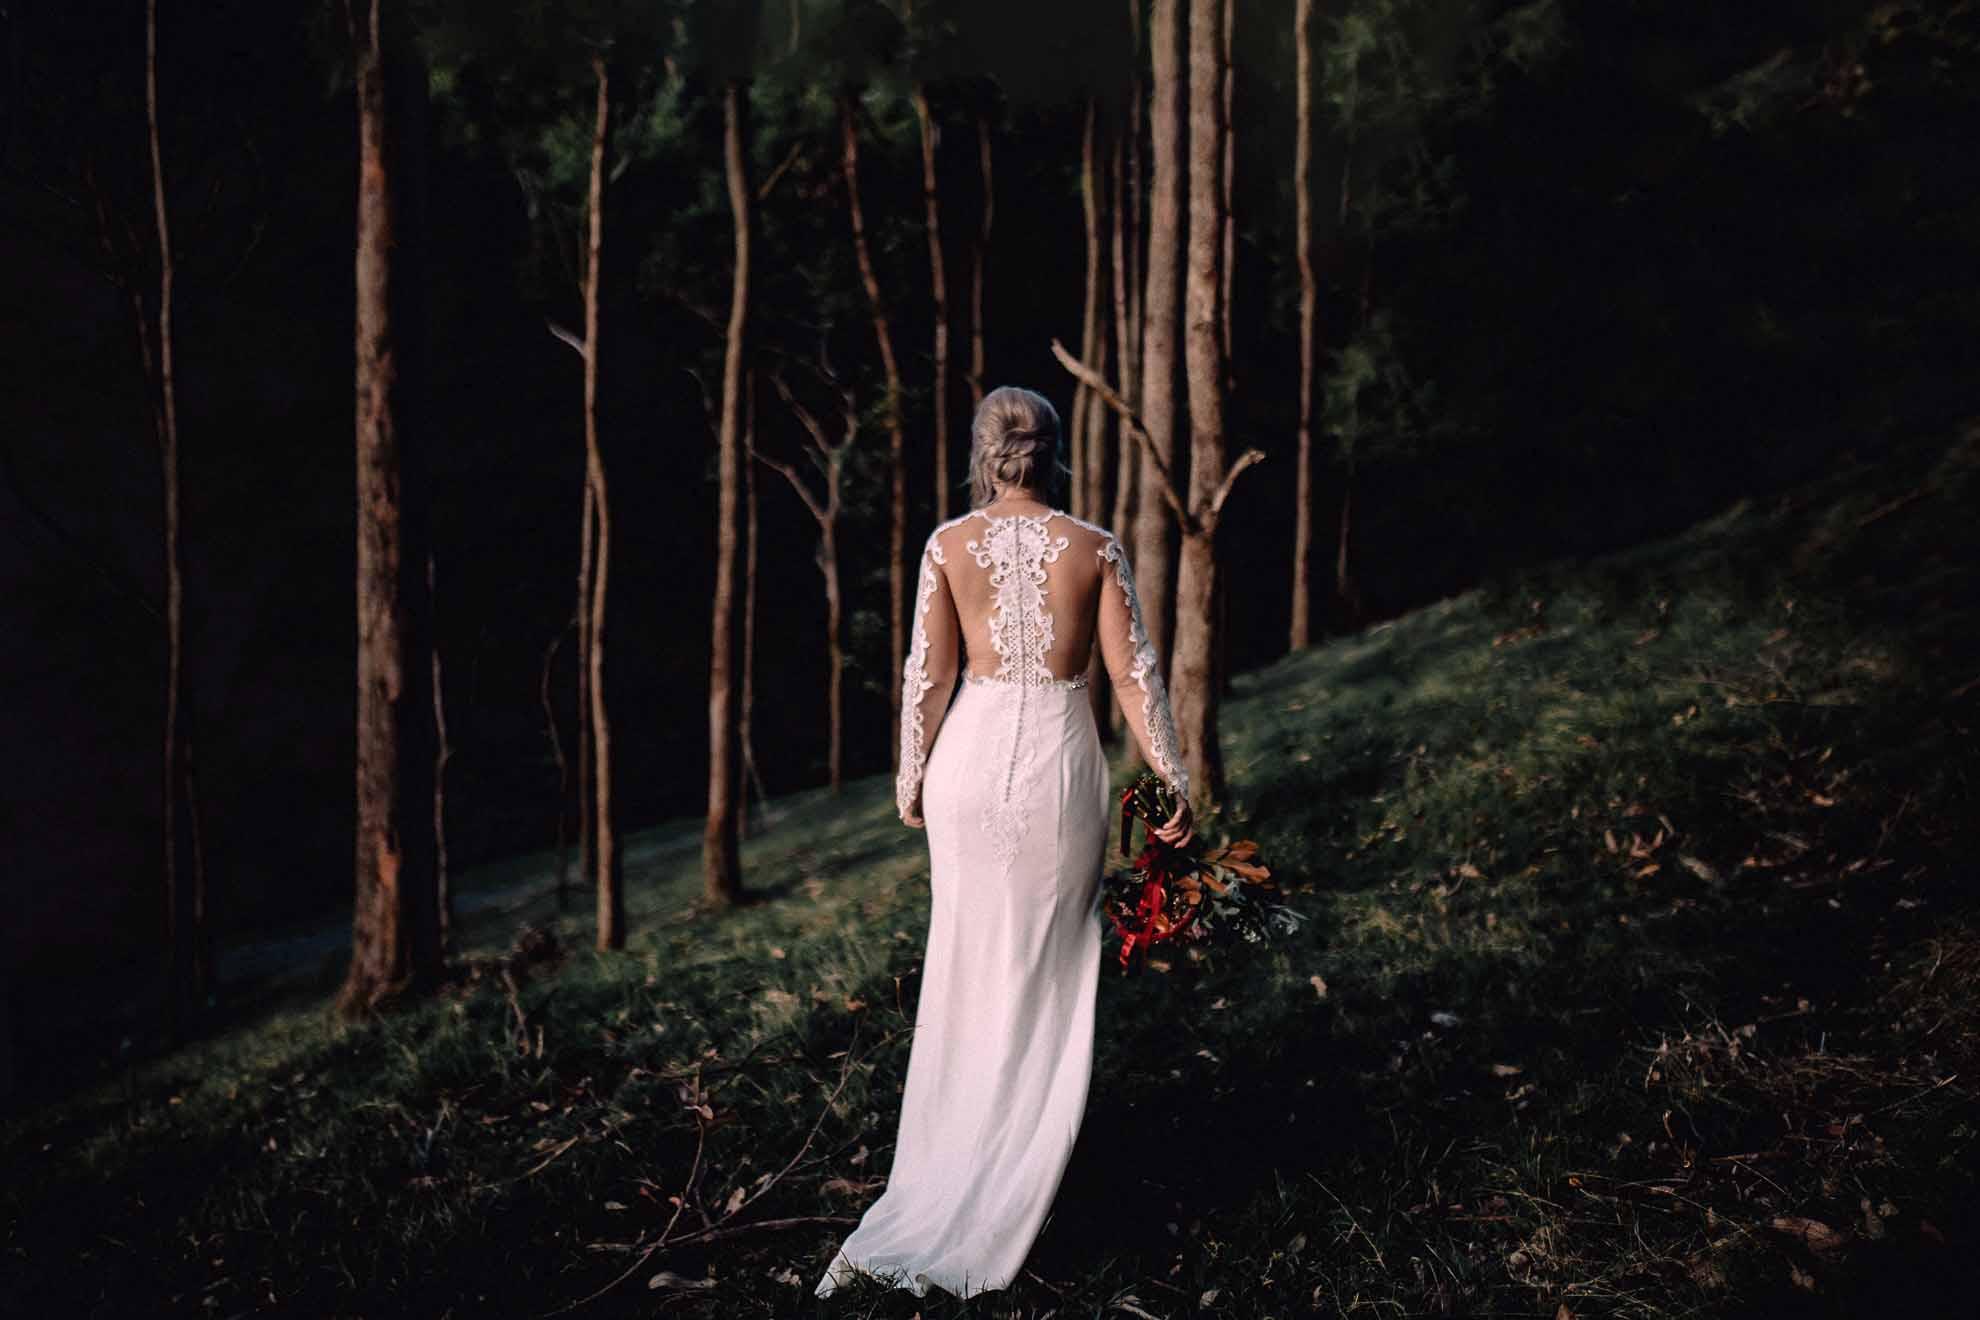 wedding-by-levien-10 copy.JPG